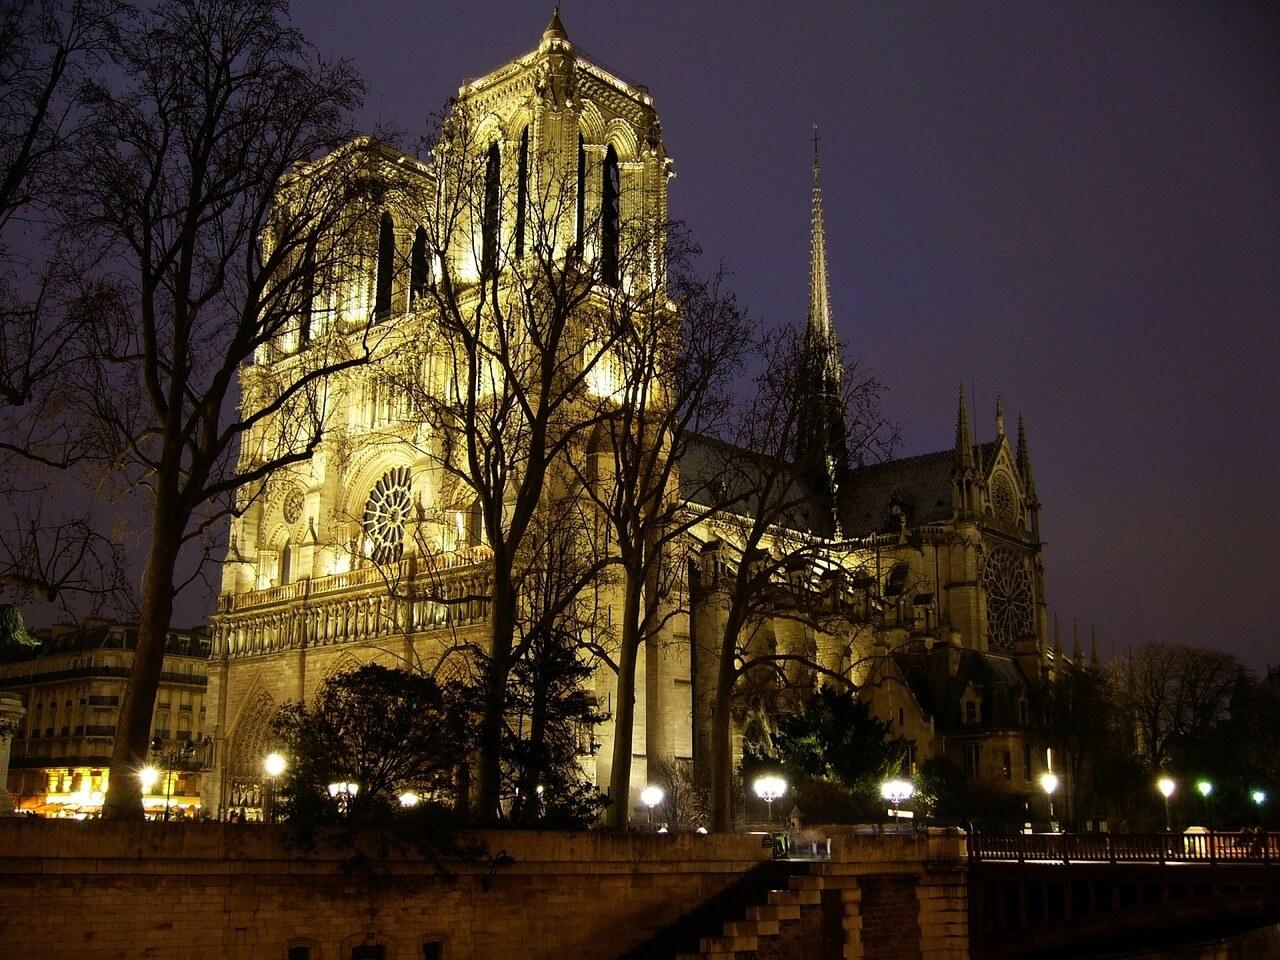 Passeios Paris, foto noturna da Catedral de Notre-Dame